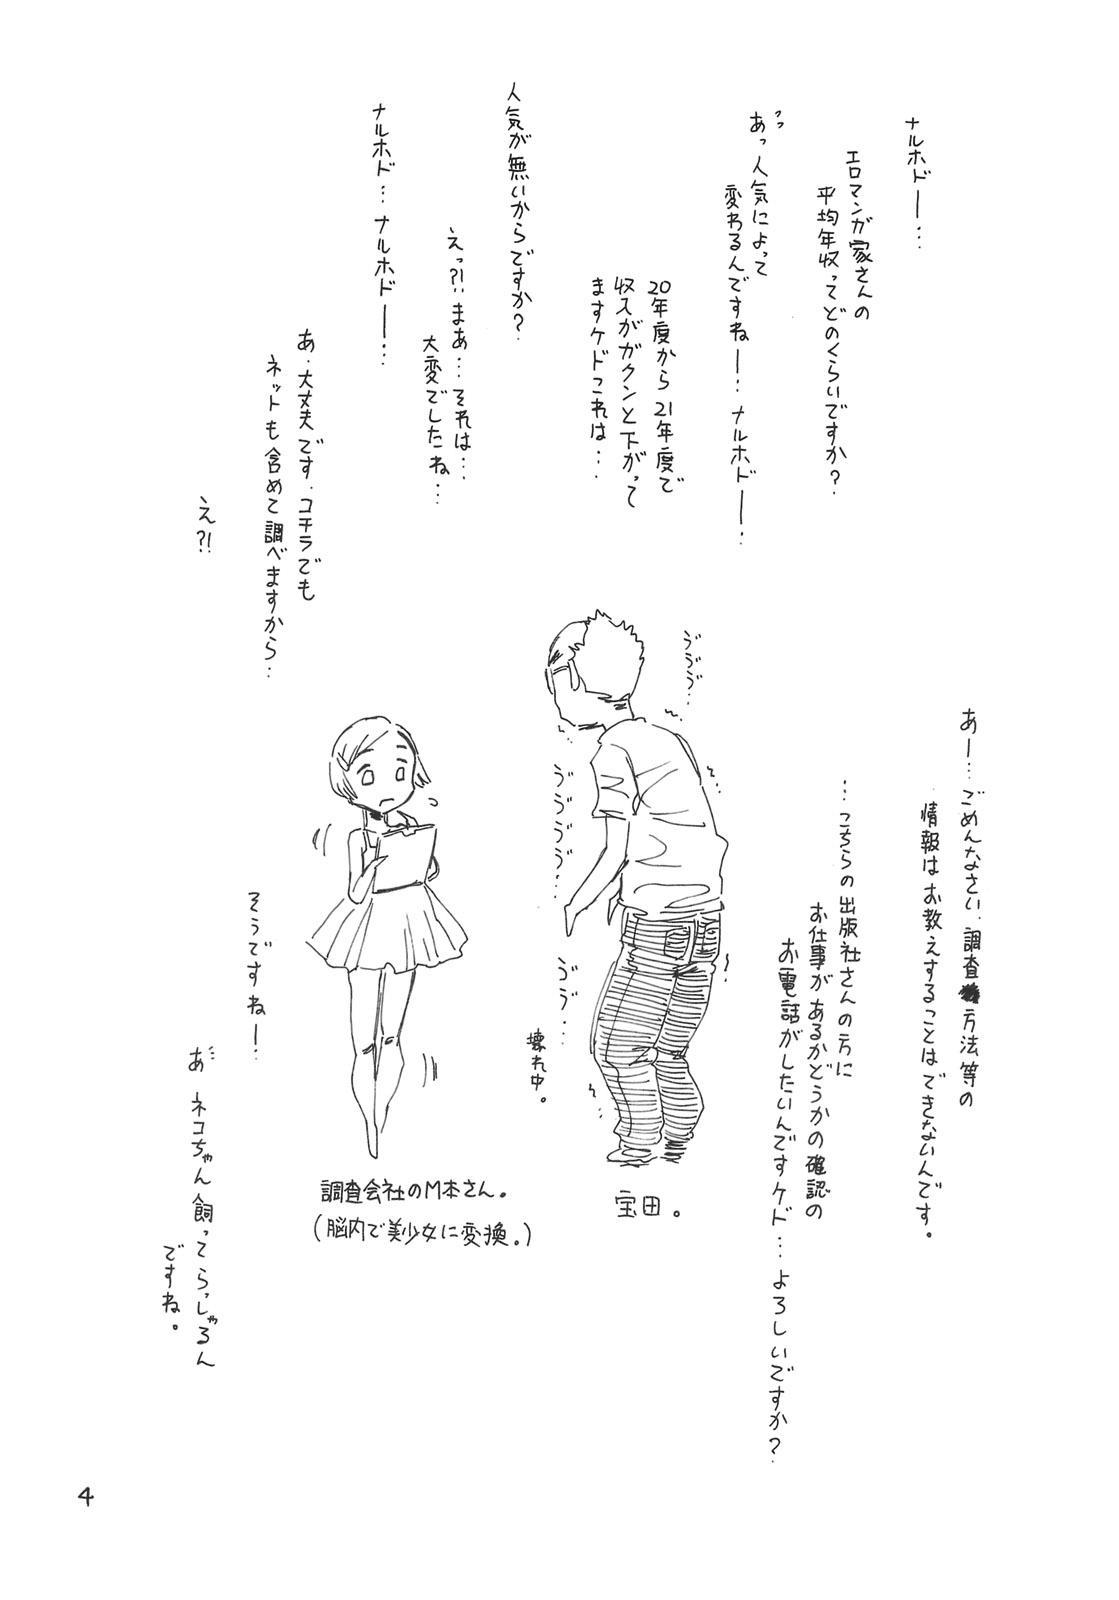 Otonari no Ibuki-san. 2